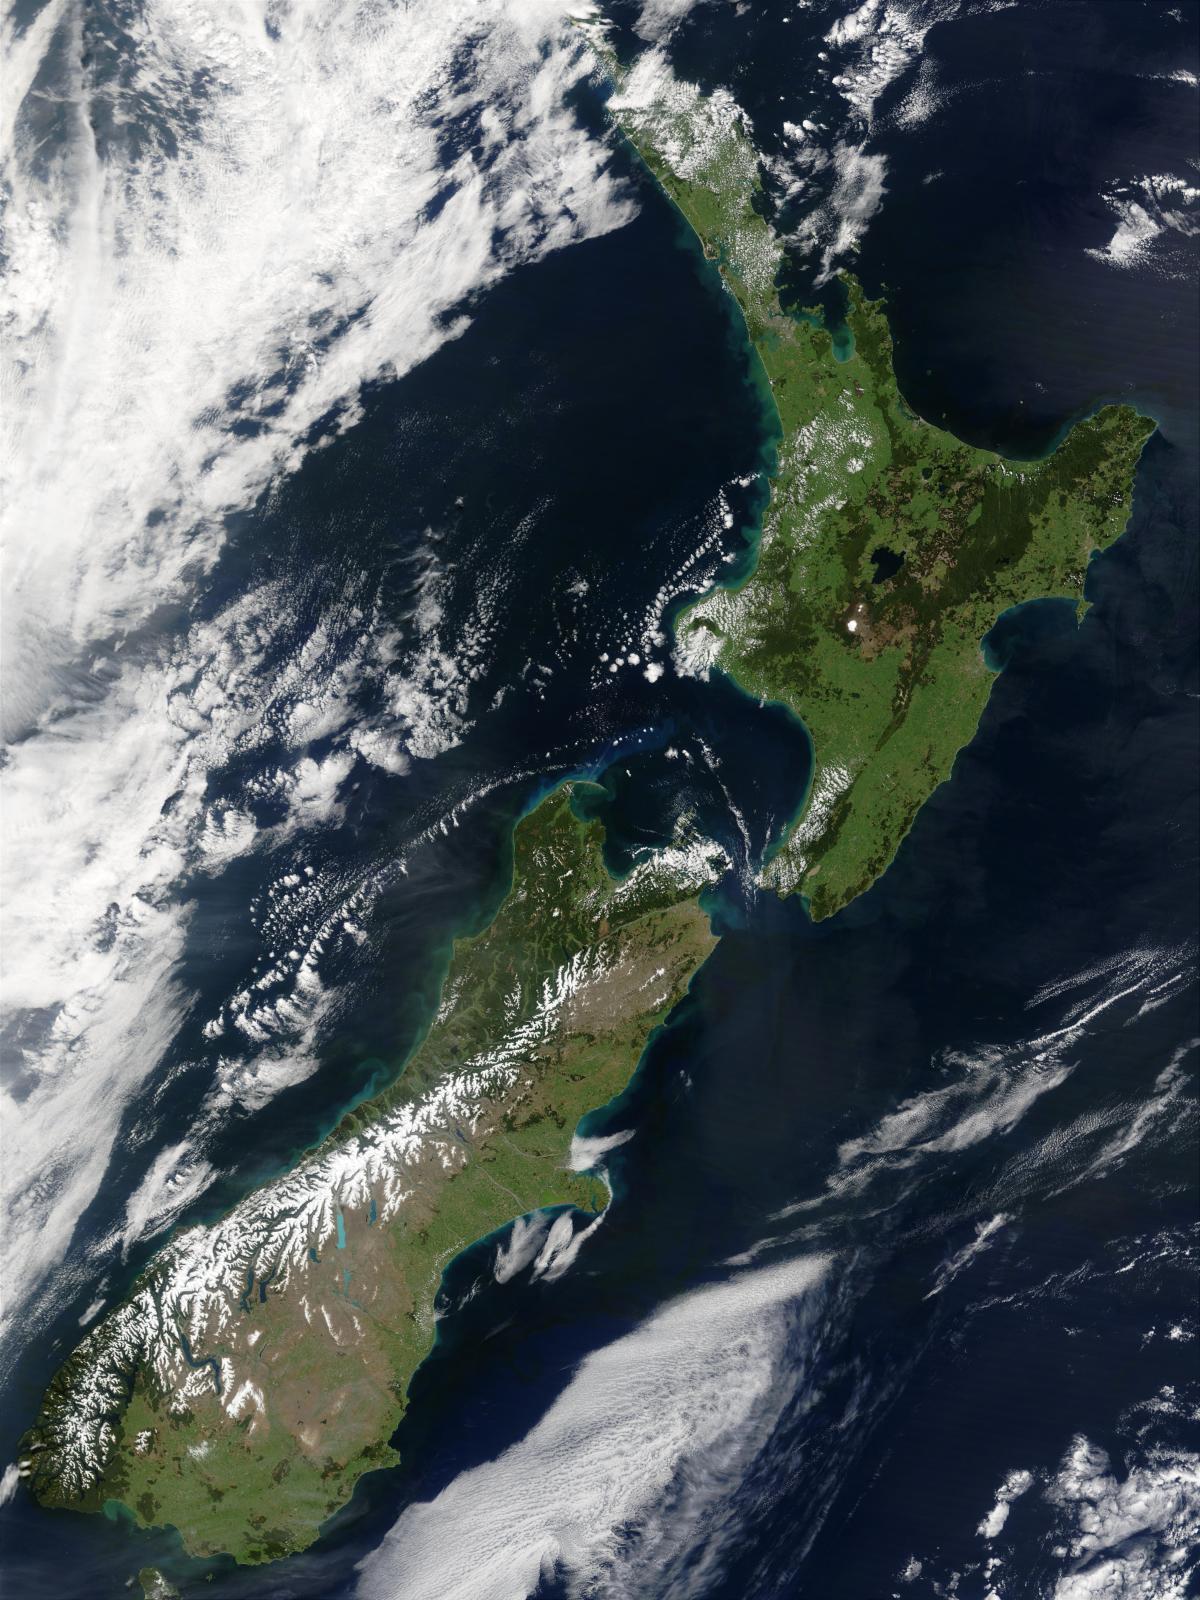 New_Zealand_23_October_2002